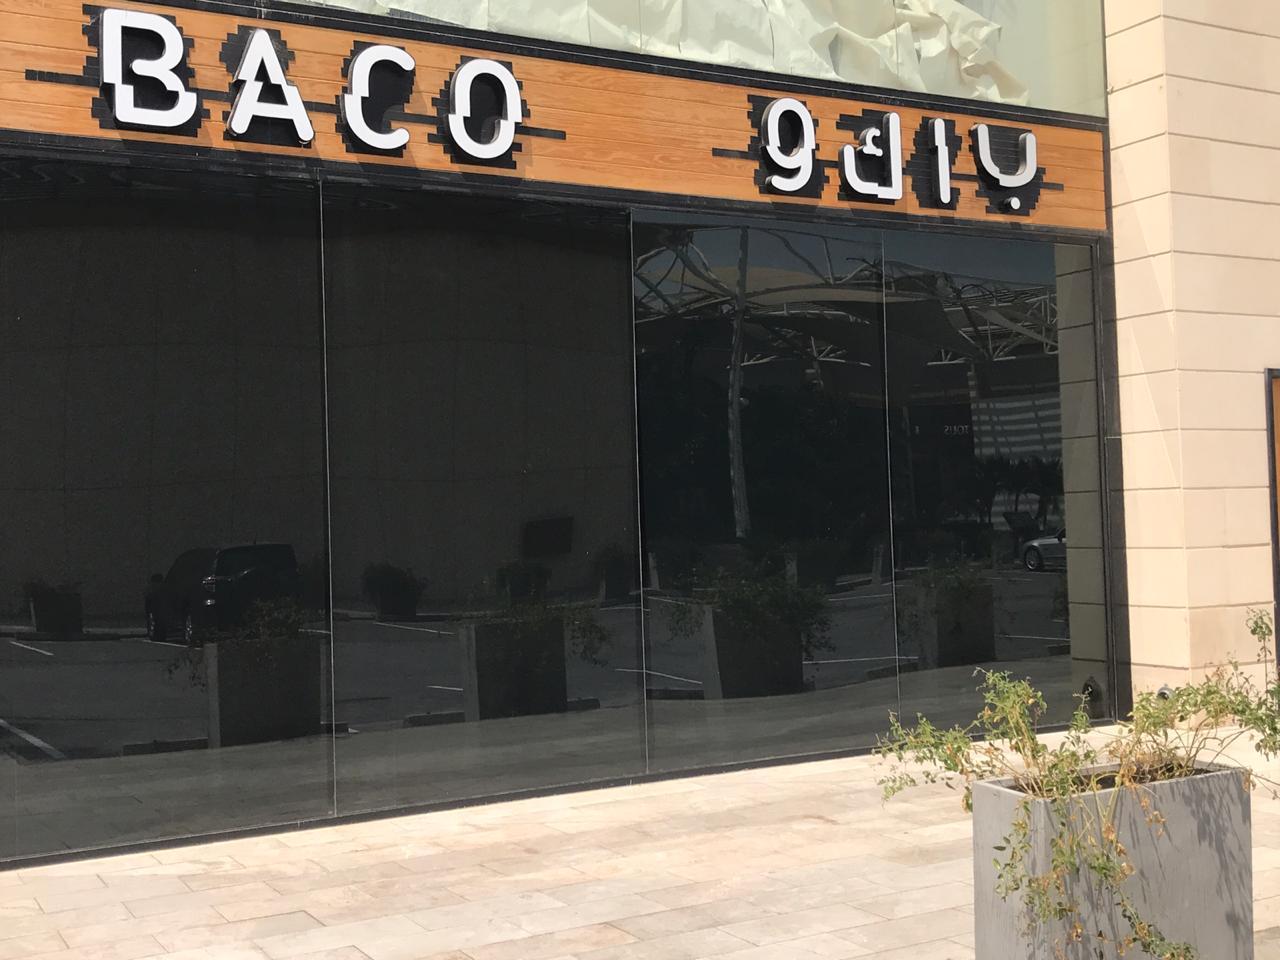 BA CO gallery